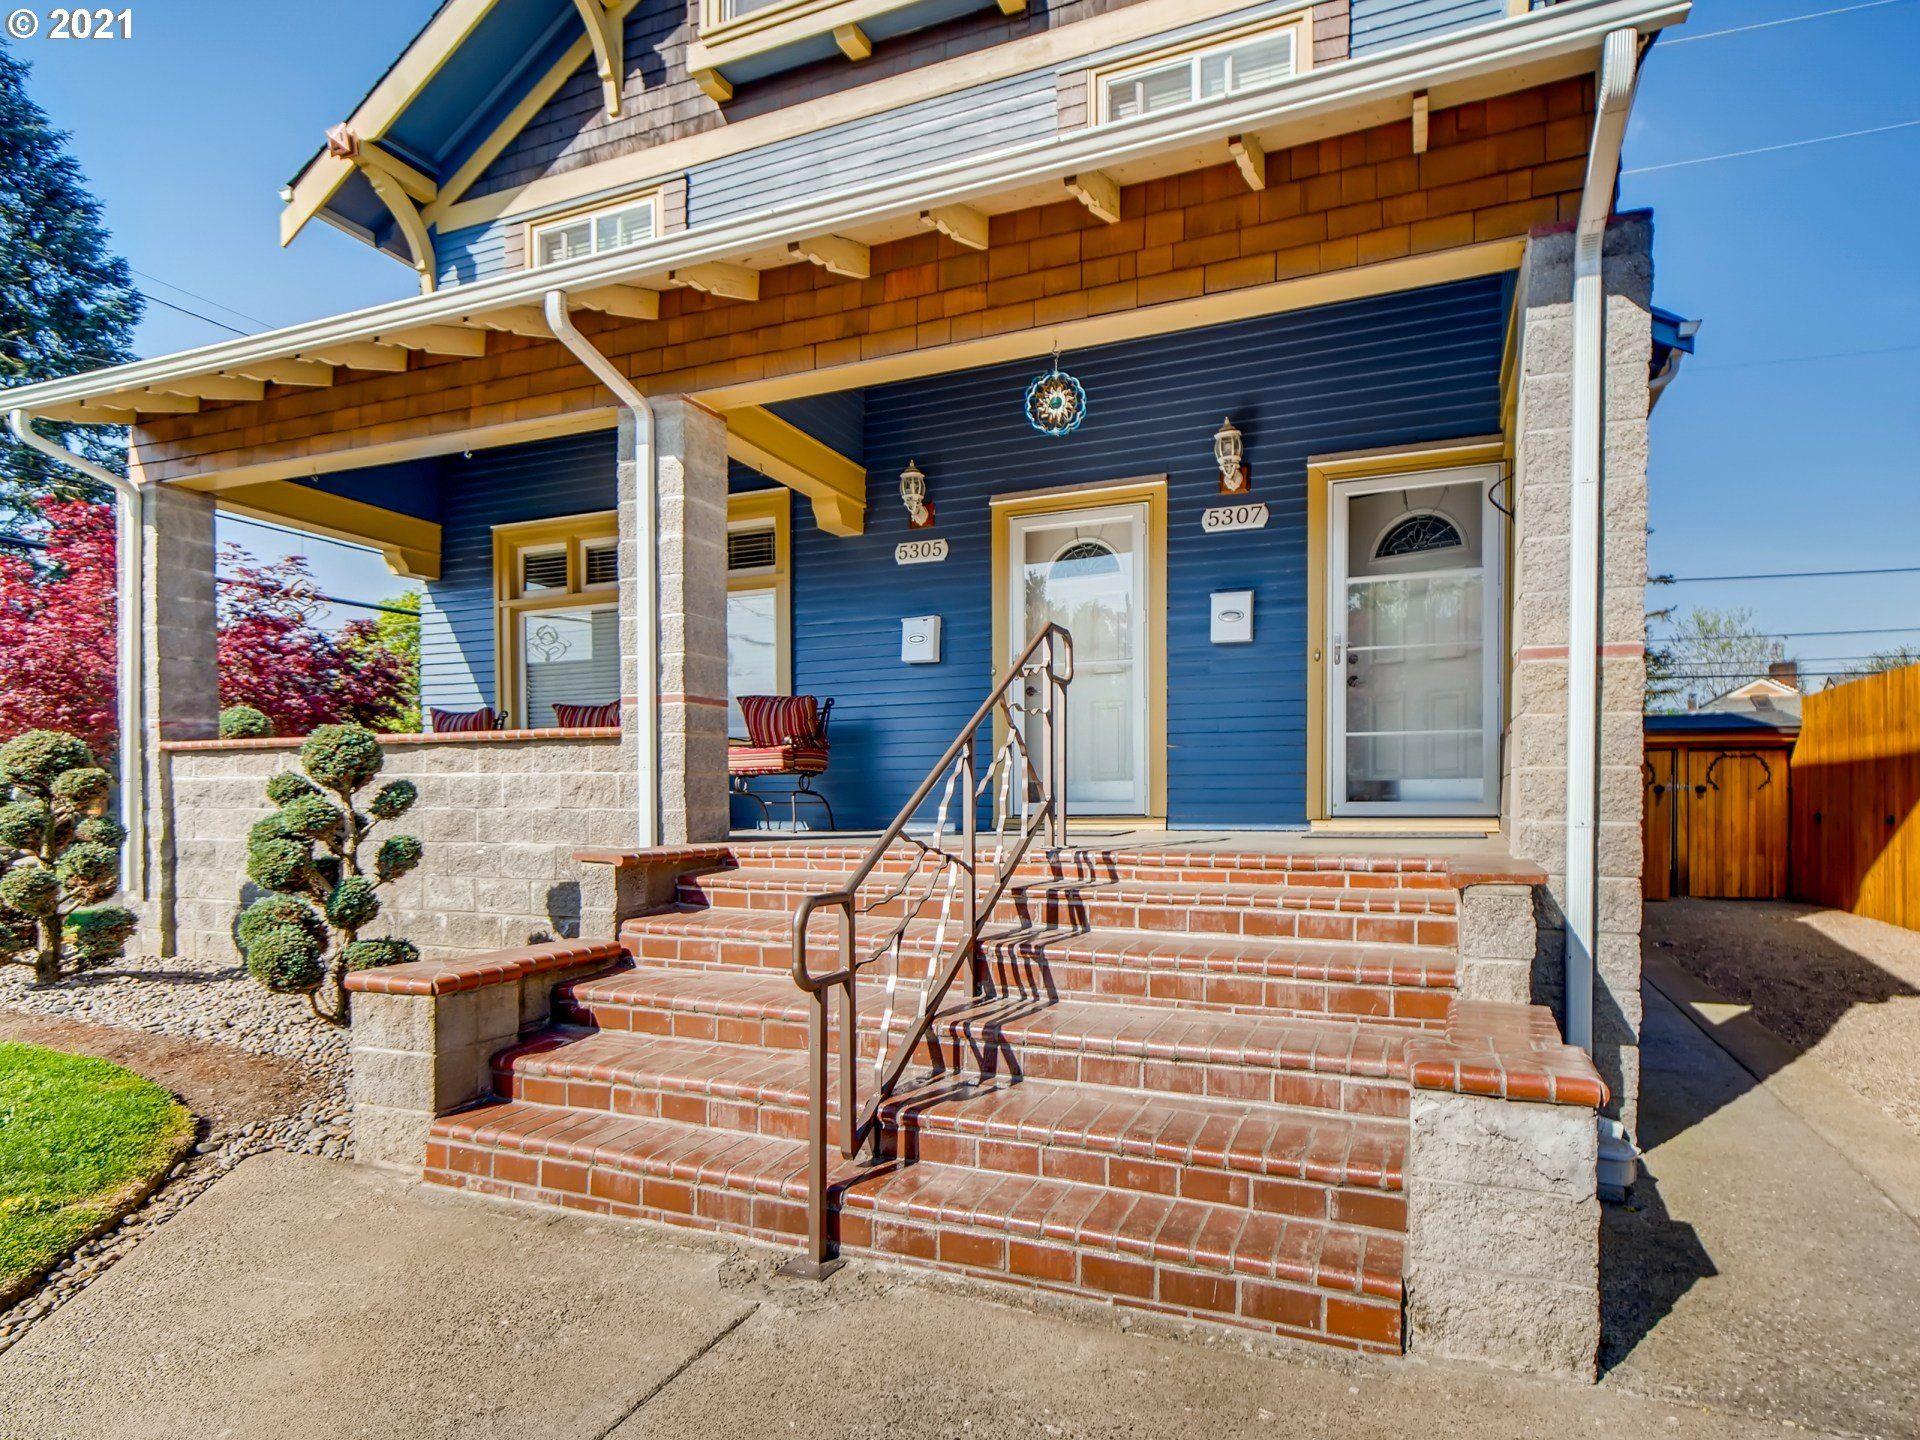 5305 NE RODNEY AVE, Portland, OR 97211 - MLS#: 21183106